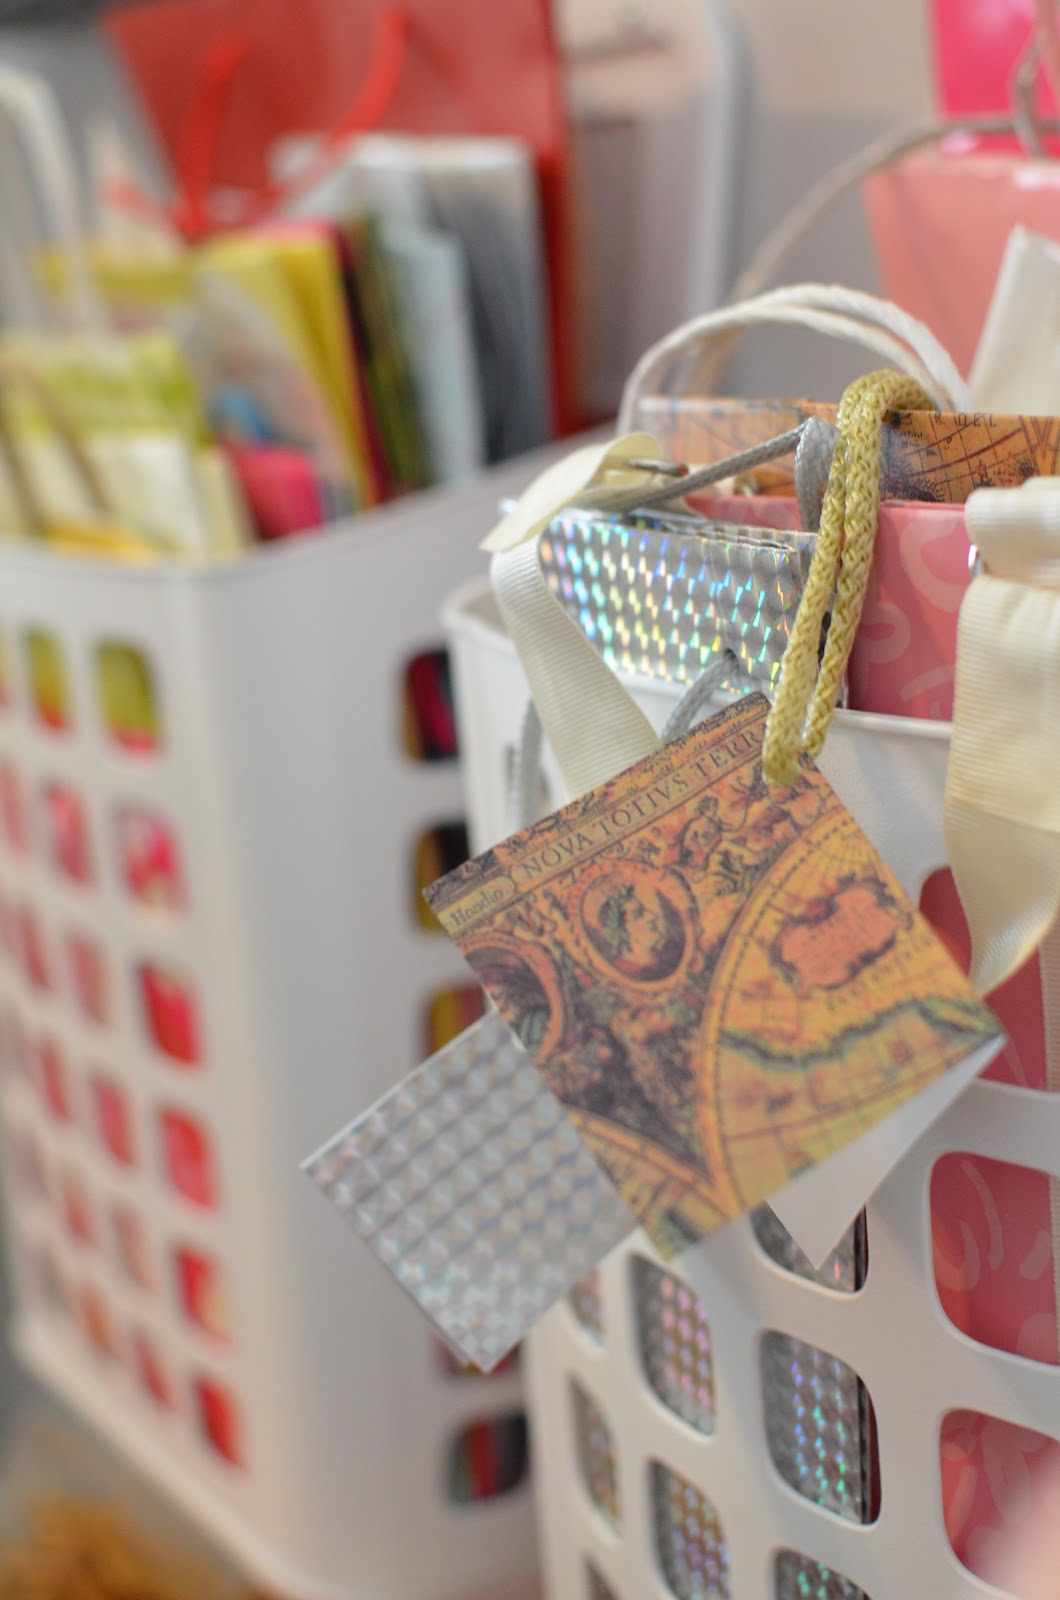 Ikea Wickelkommode Hemnes Neupreis ~ RATIONELL VARIERA Trash Baskets for gift bags